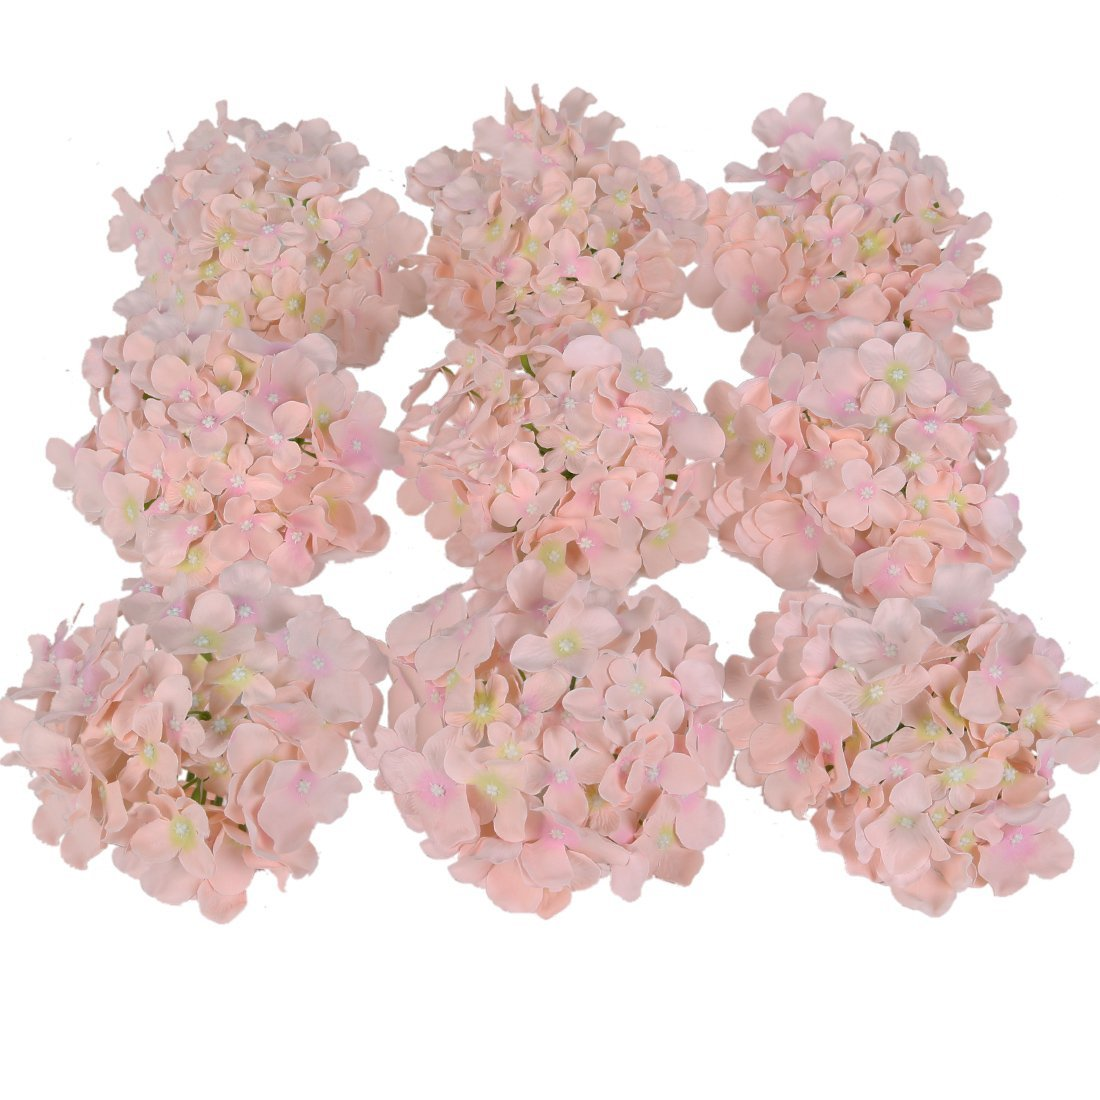 Buy High Grade Hydrangeamini Hydrangeaartificial Flowerssilk